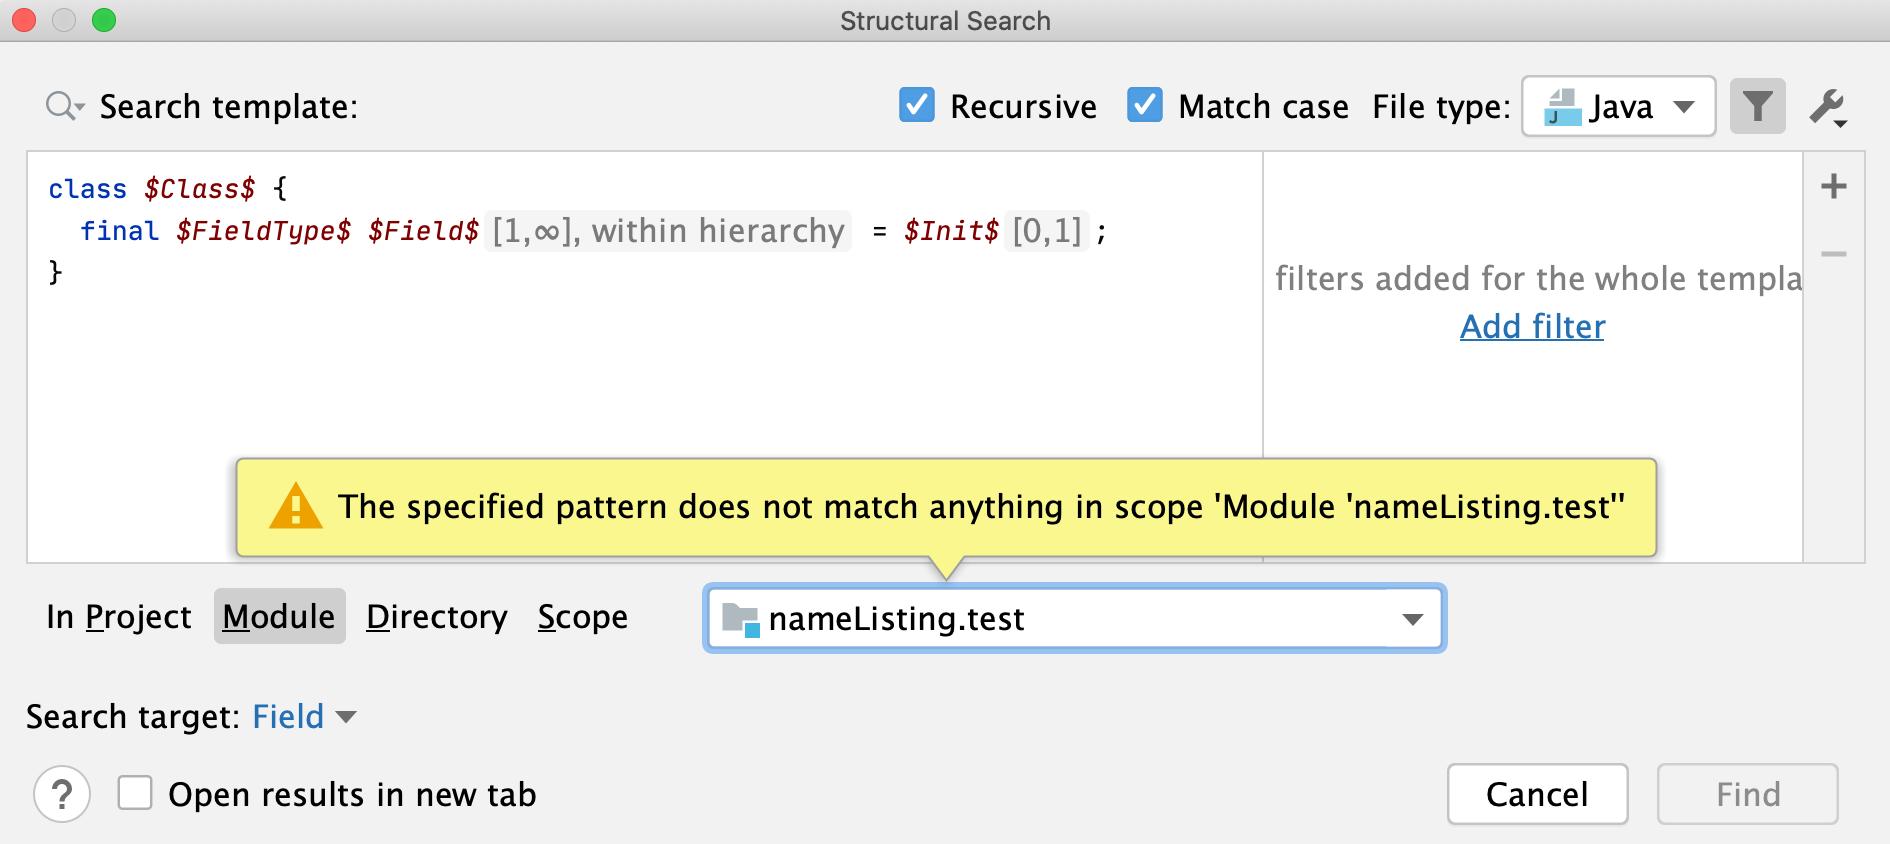 Structural Search dialog: module scope